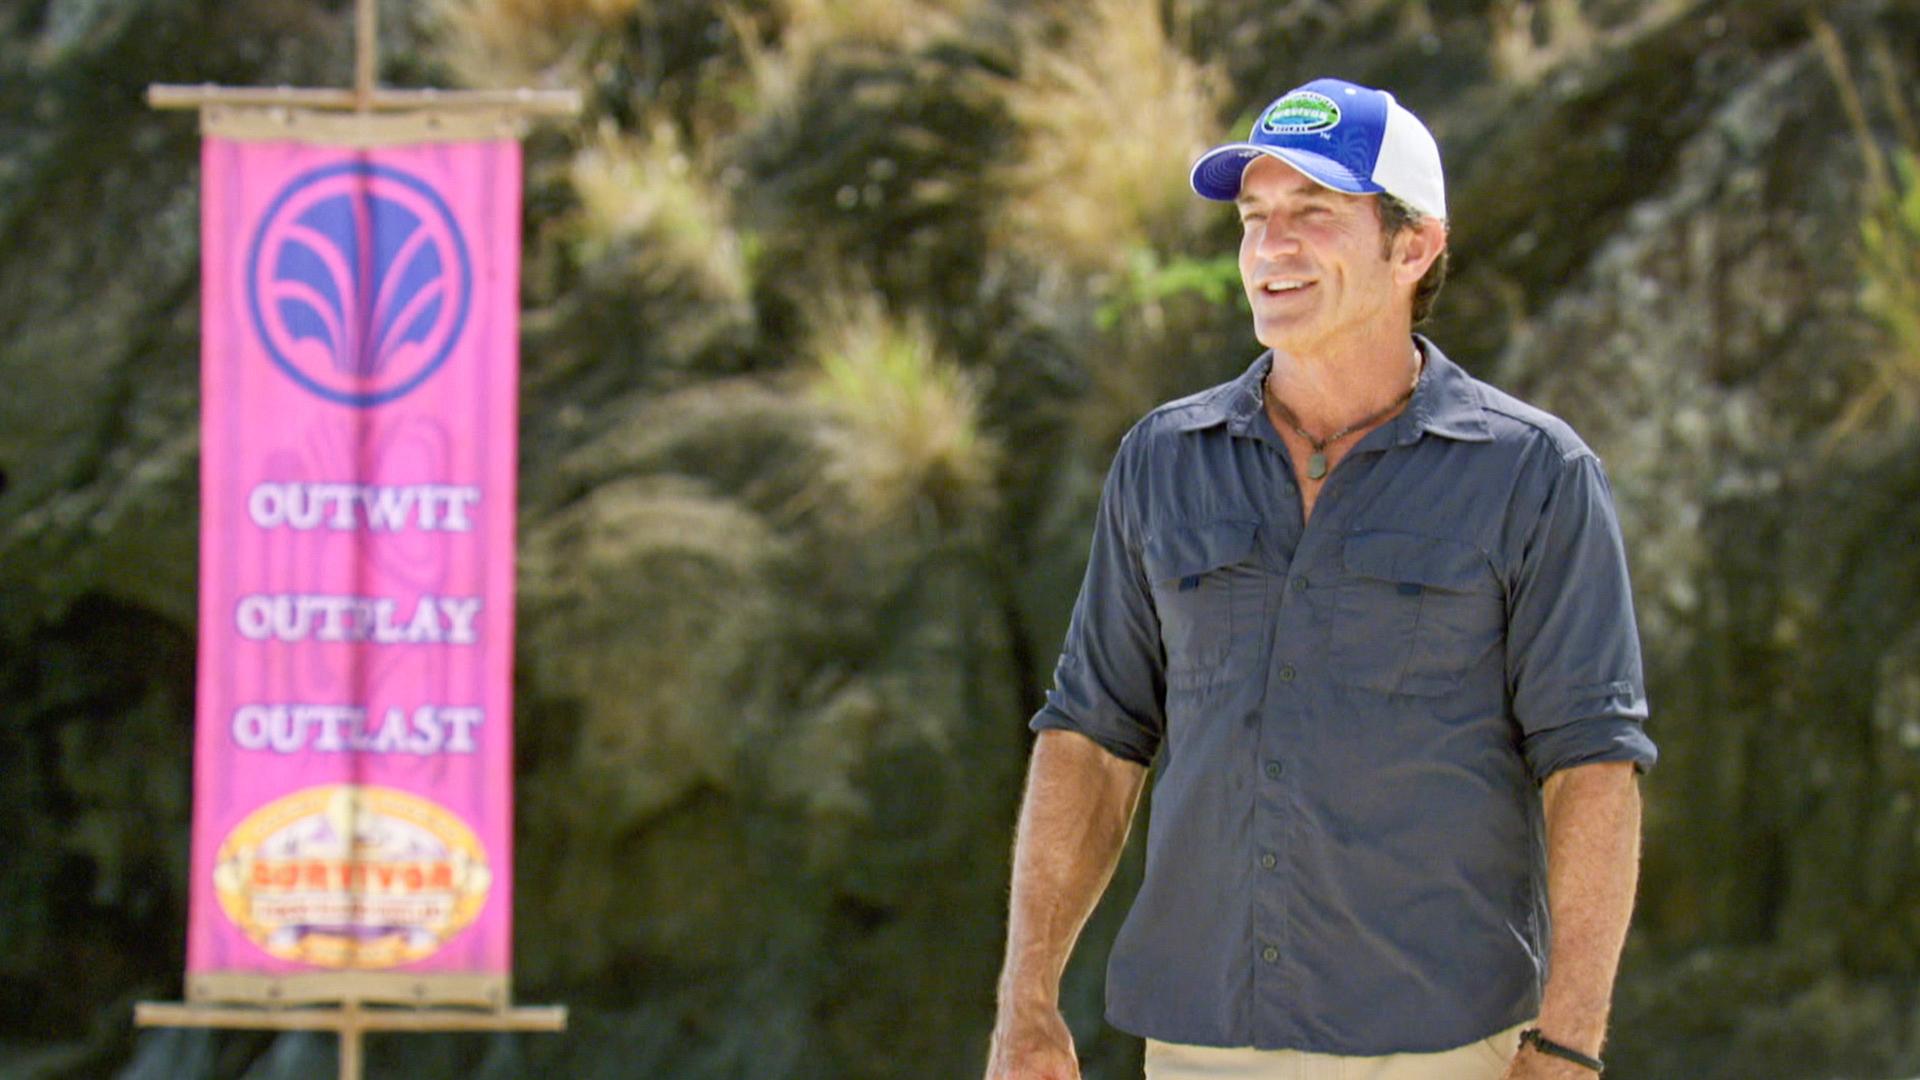 Survivor host Jeff Probst has so many inspiring things to say each season.